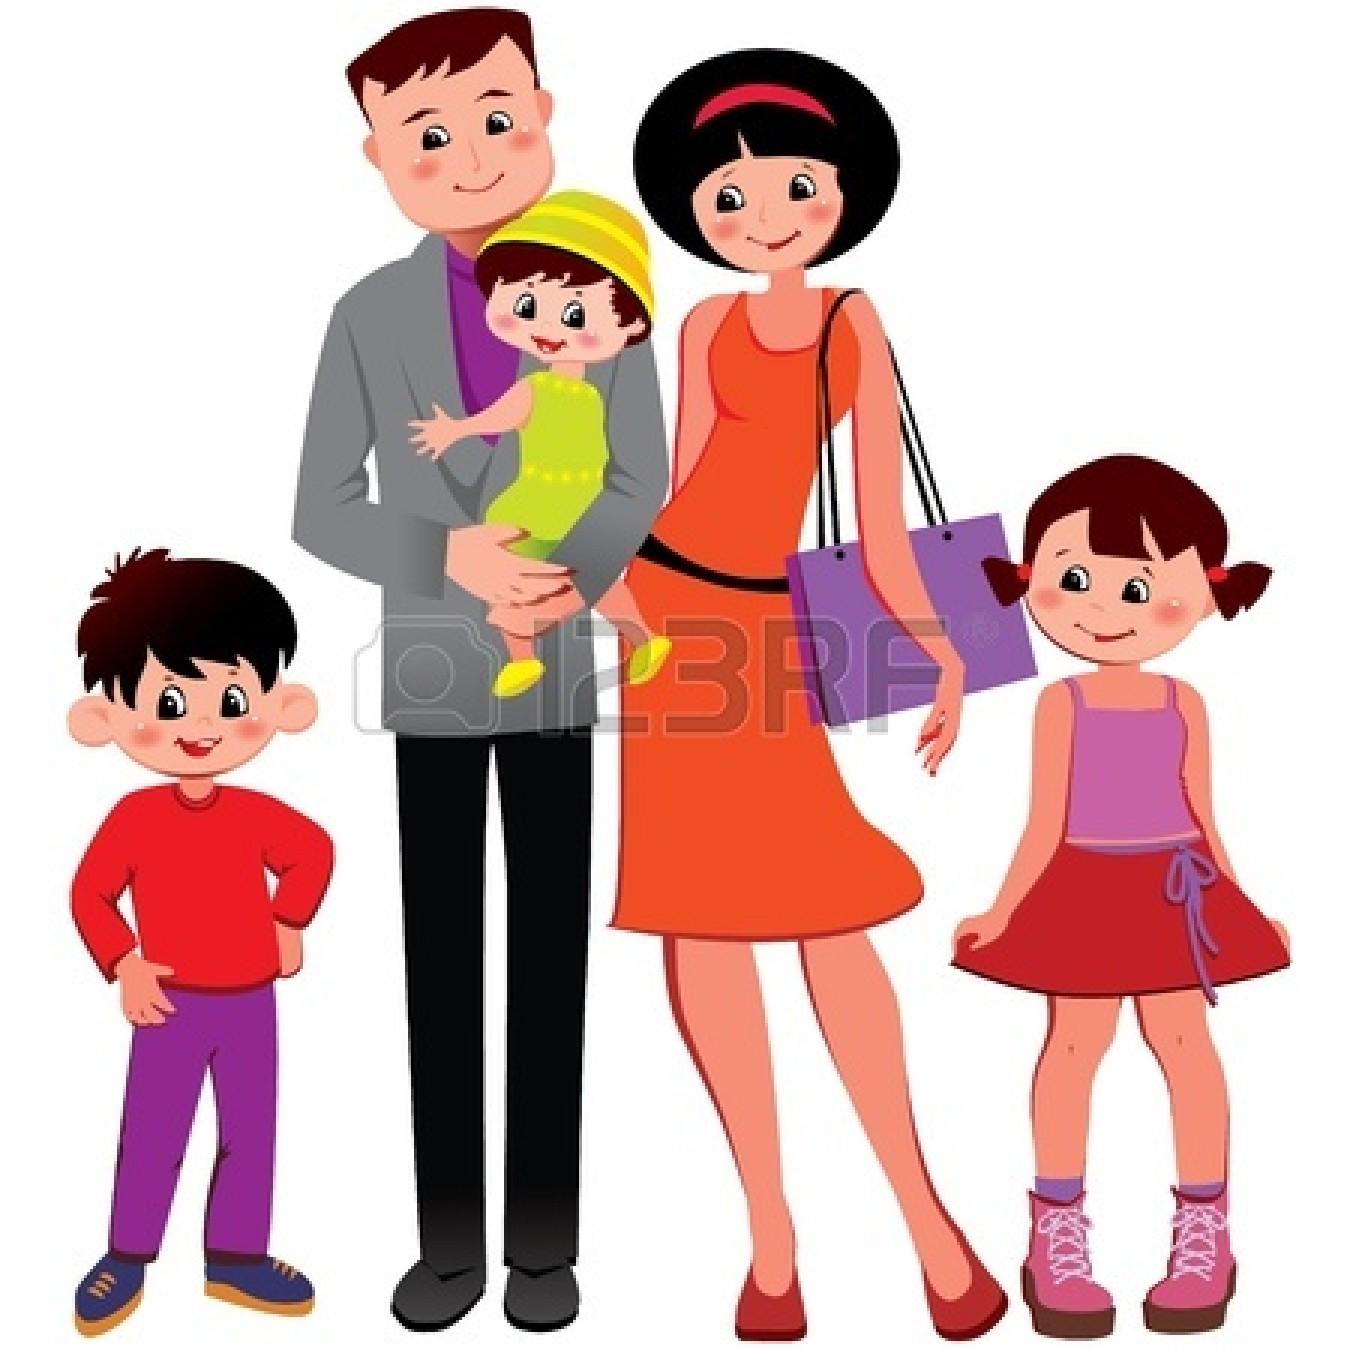 Free clipart family clipart famly image #946